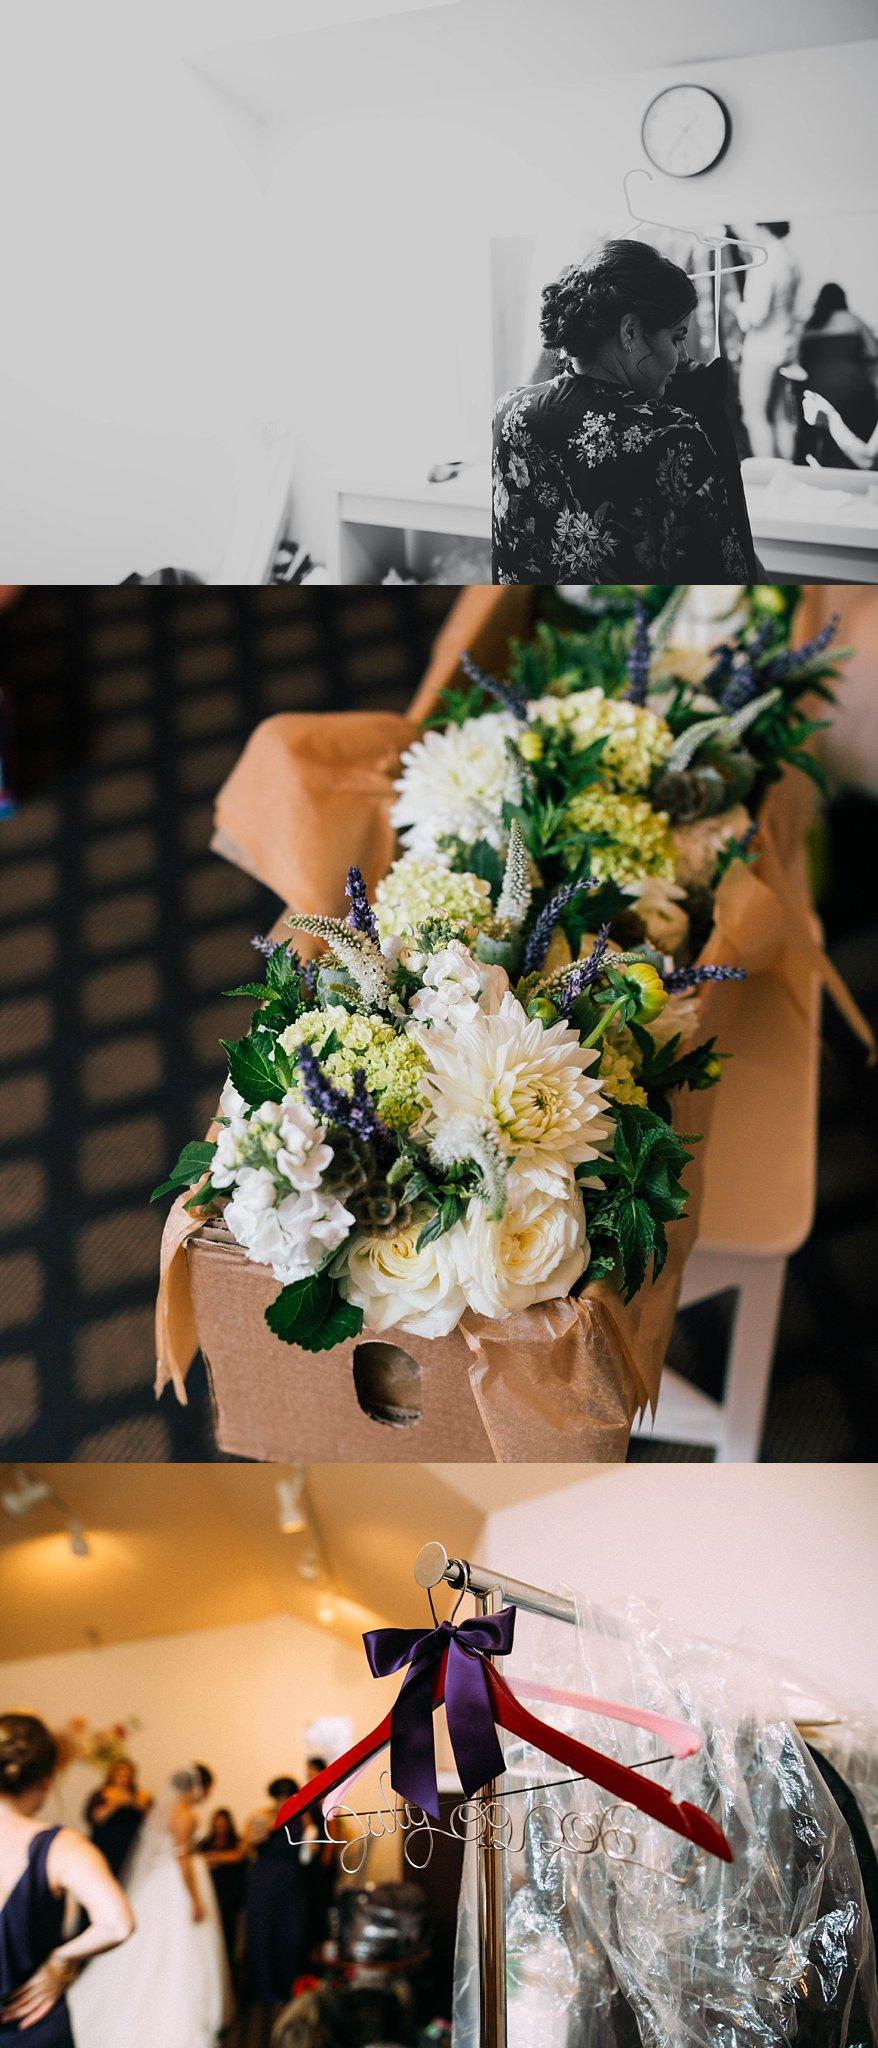 ashley_vos_seattle_wedding_photographer_0084.jpg